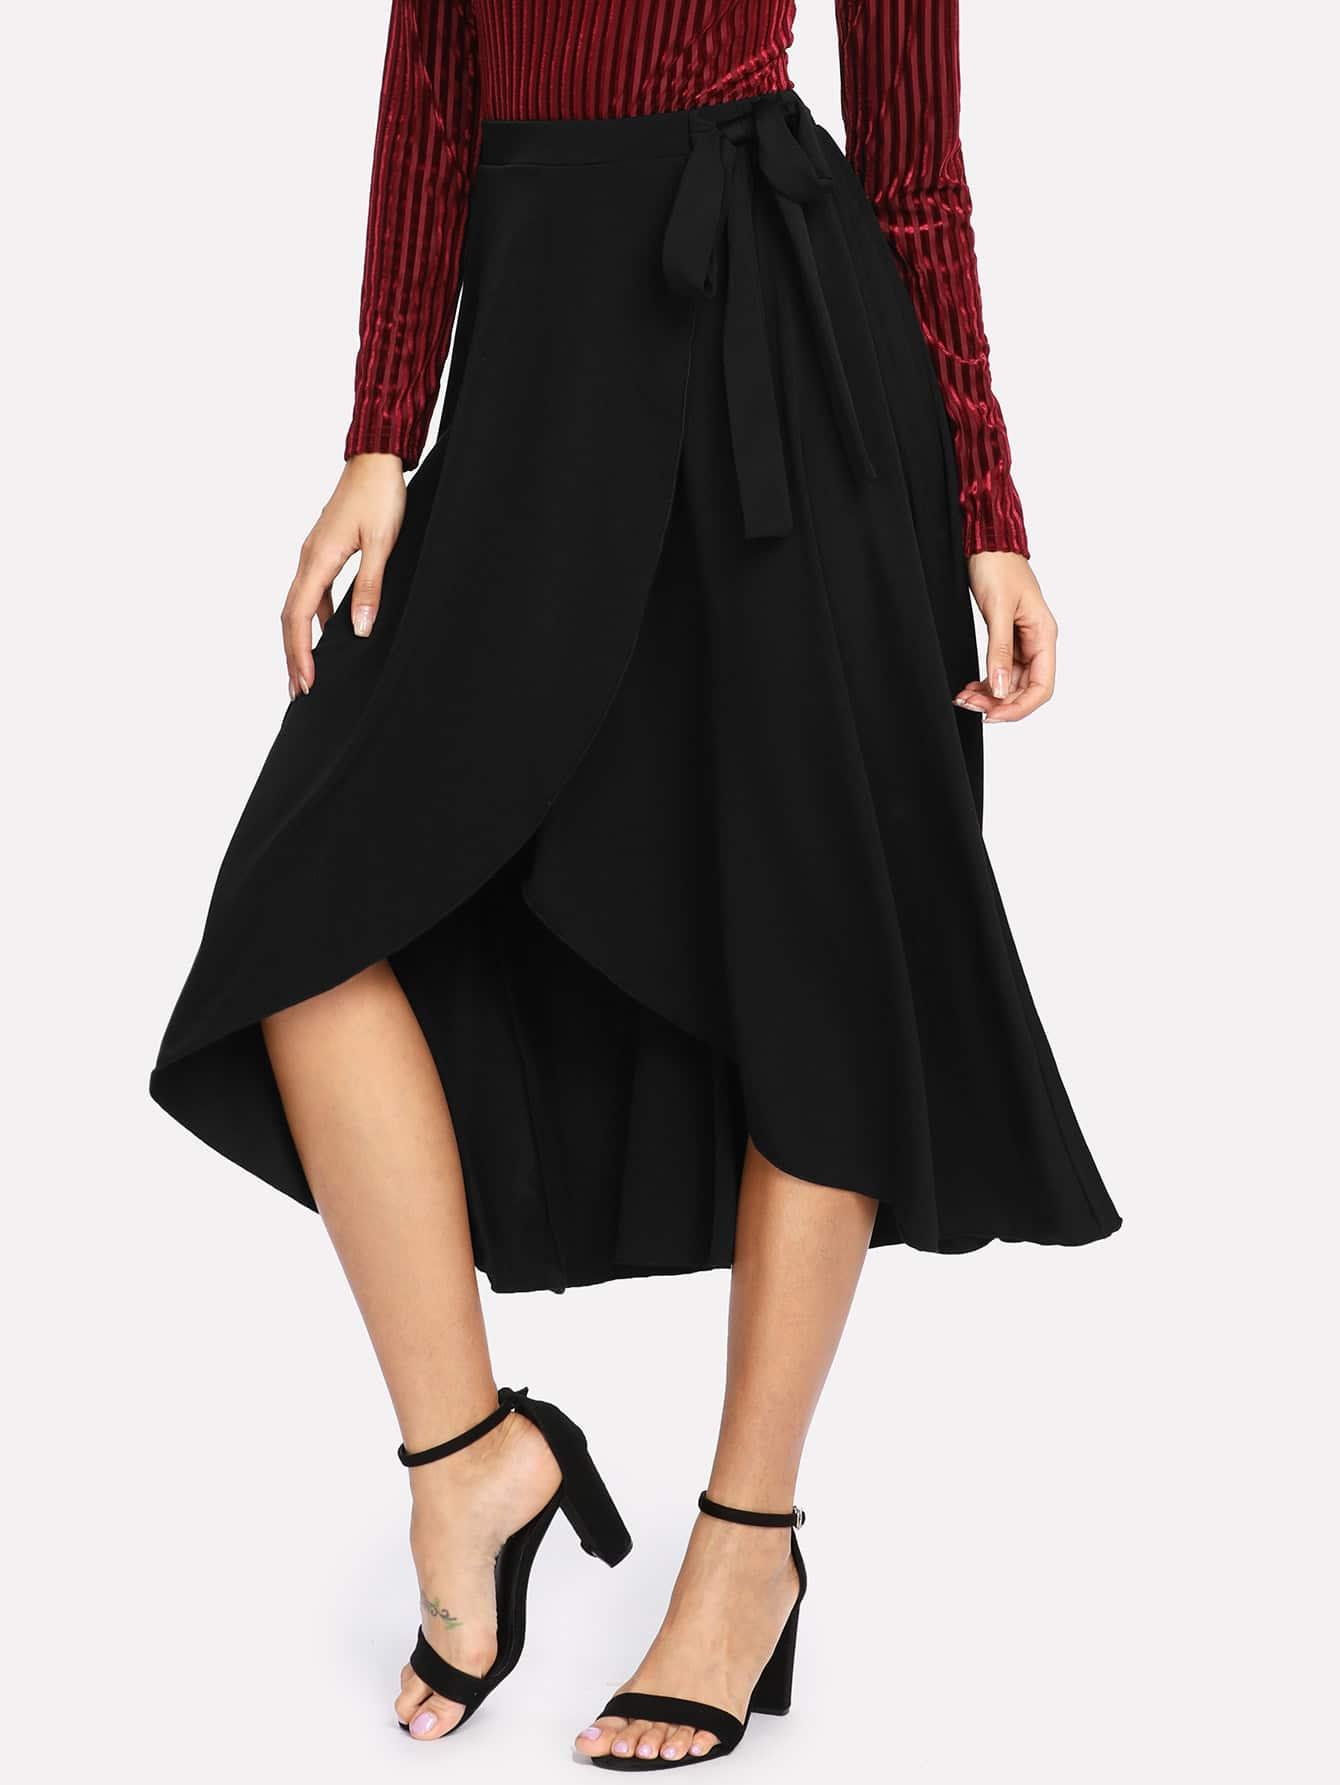 Self Belted Asymmetrical Skirt